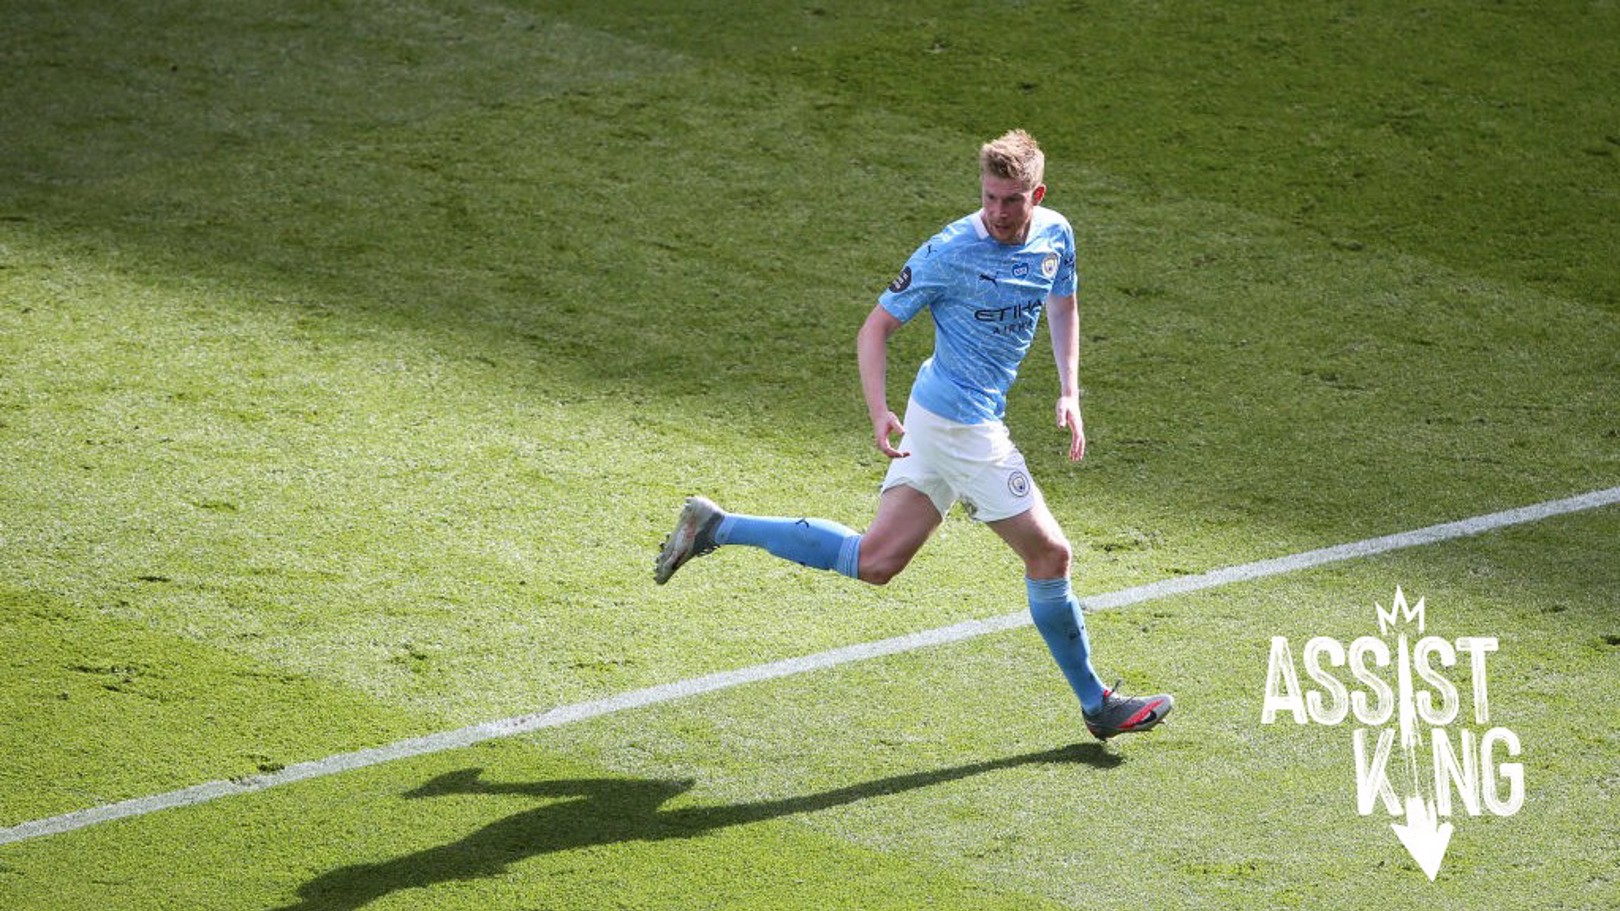 Breaking down assist king De Bruyne's passing